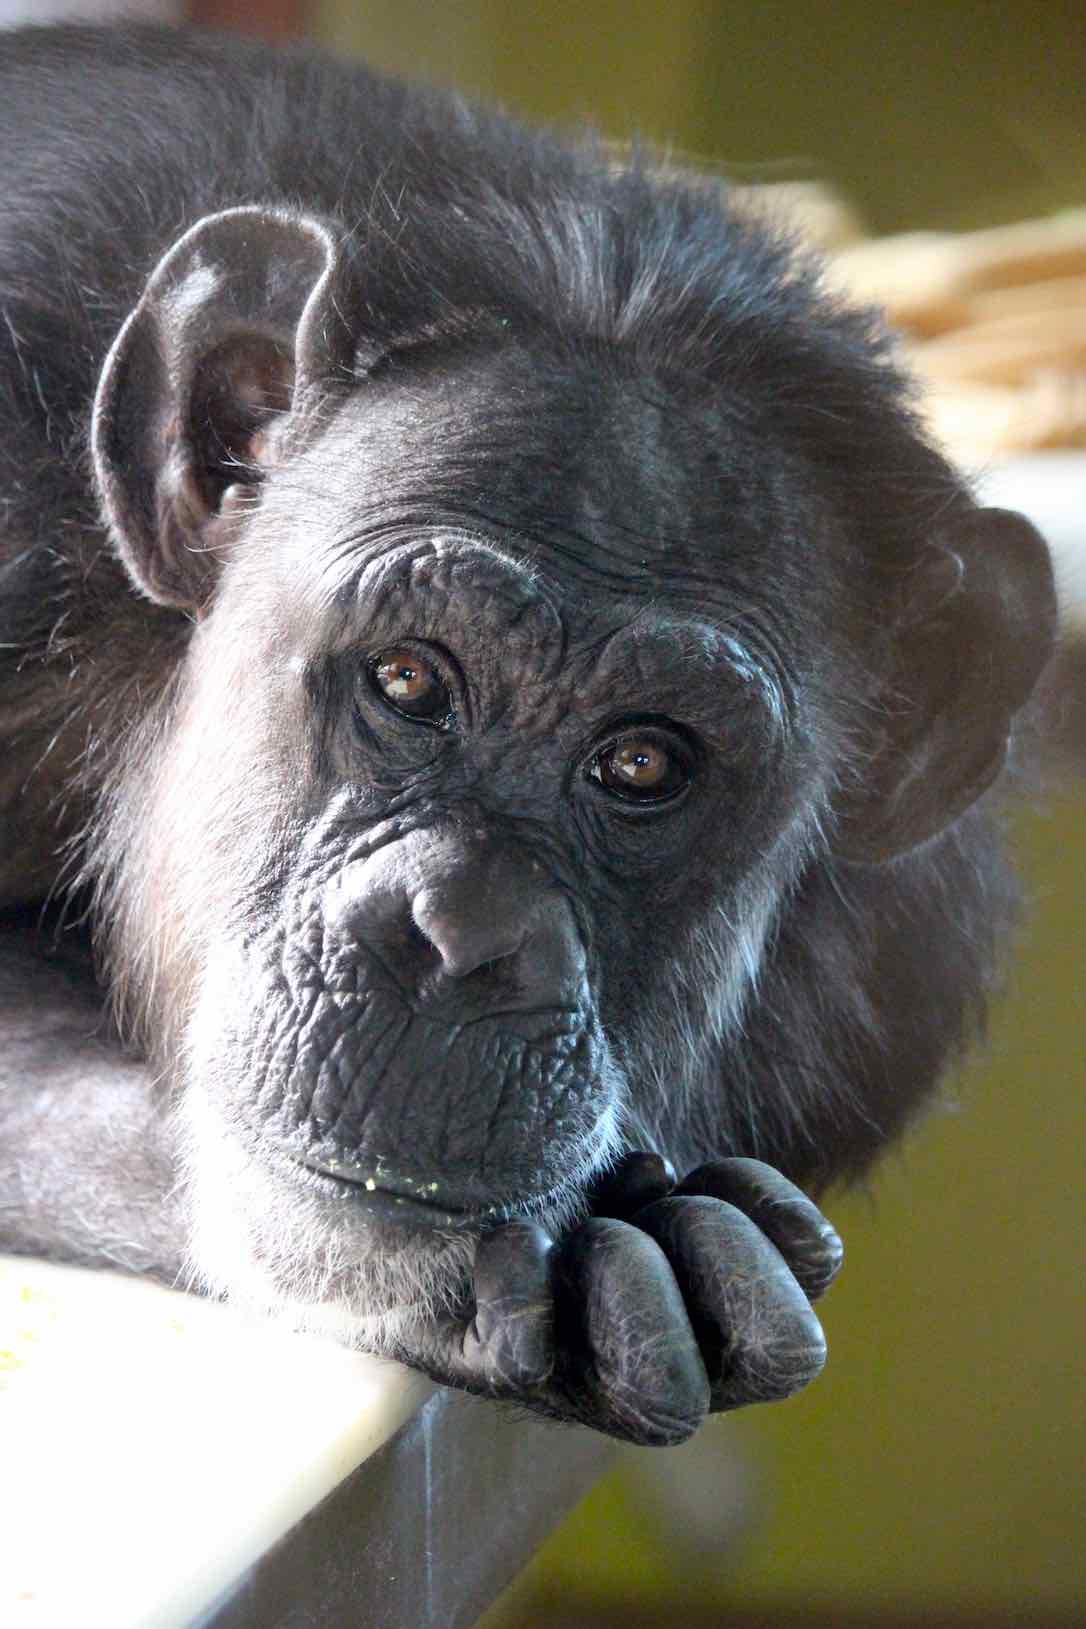 pretty-shaved-ape-photos-farrell